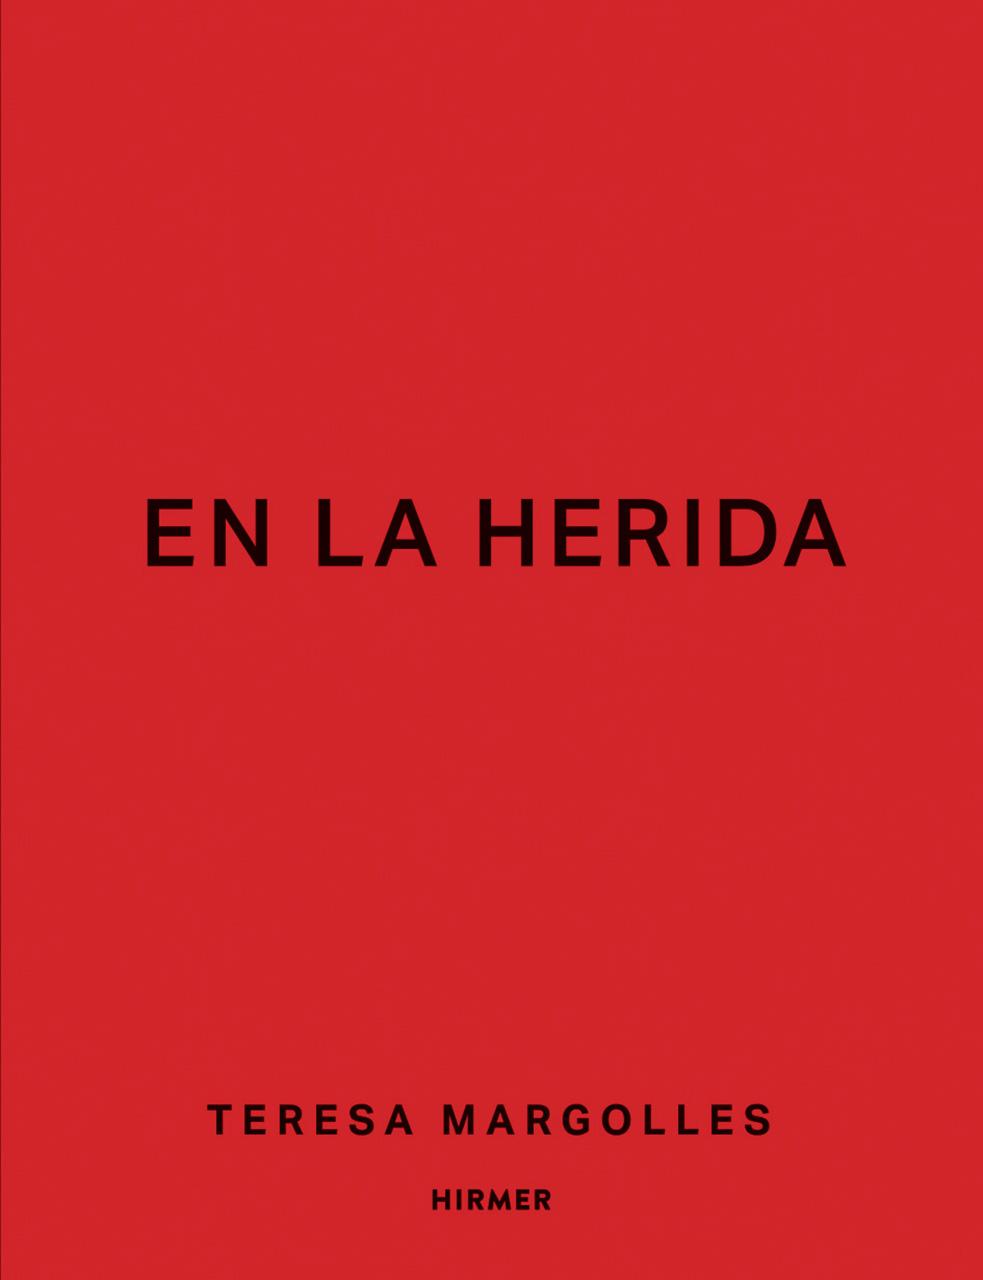 Teresa Margolles